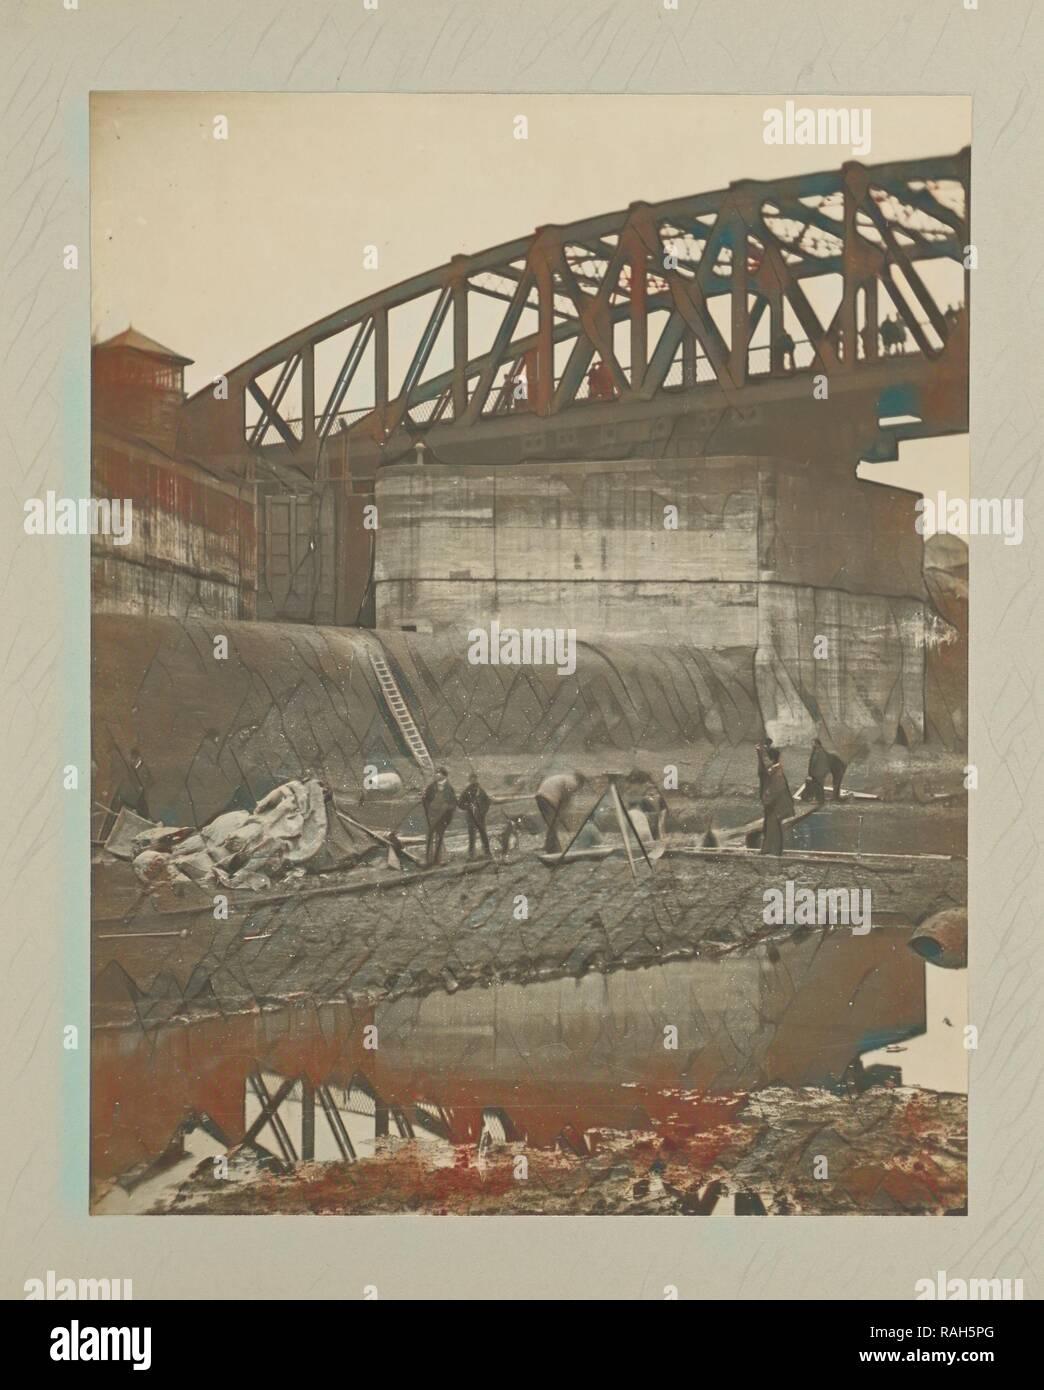 Stockton Heath - Cutting under Swing Bridge, G. Herbert & Horace C. Bayley, Manchester, England, negative November reimagined - Stock Image